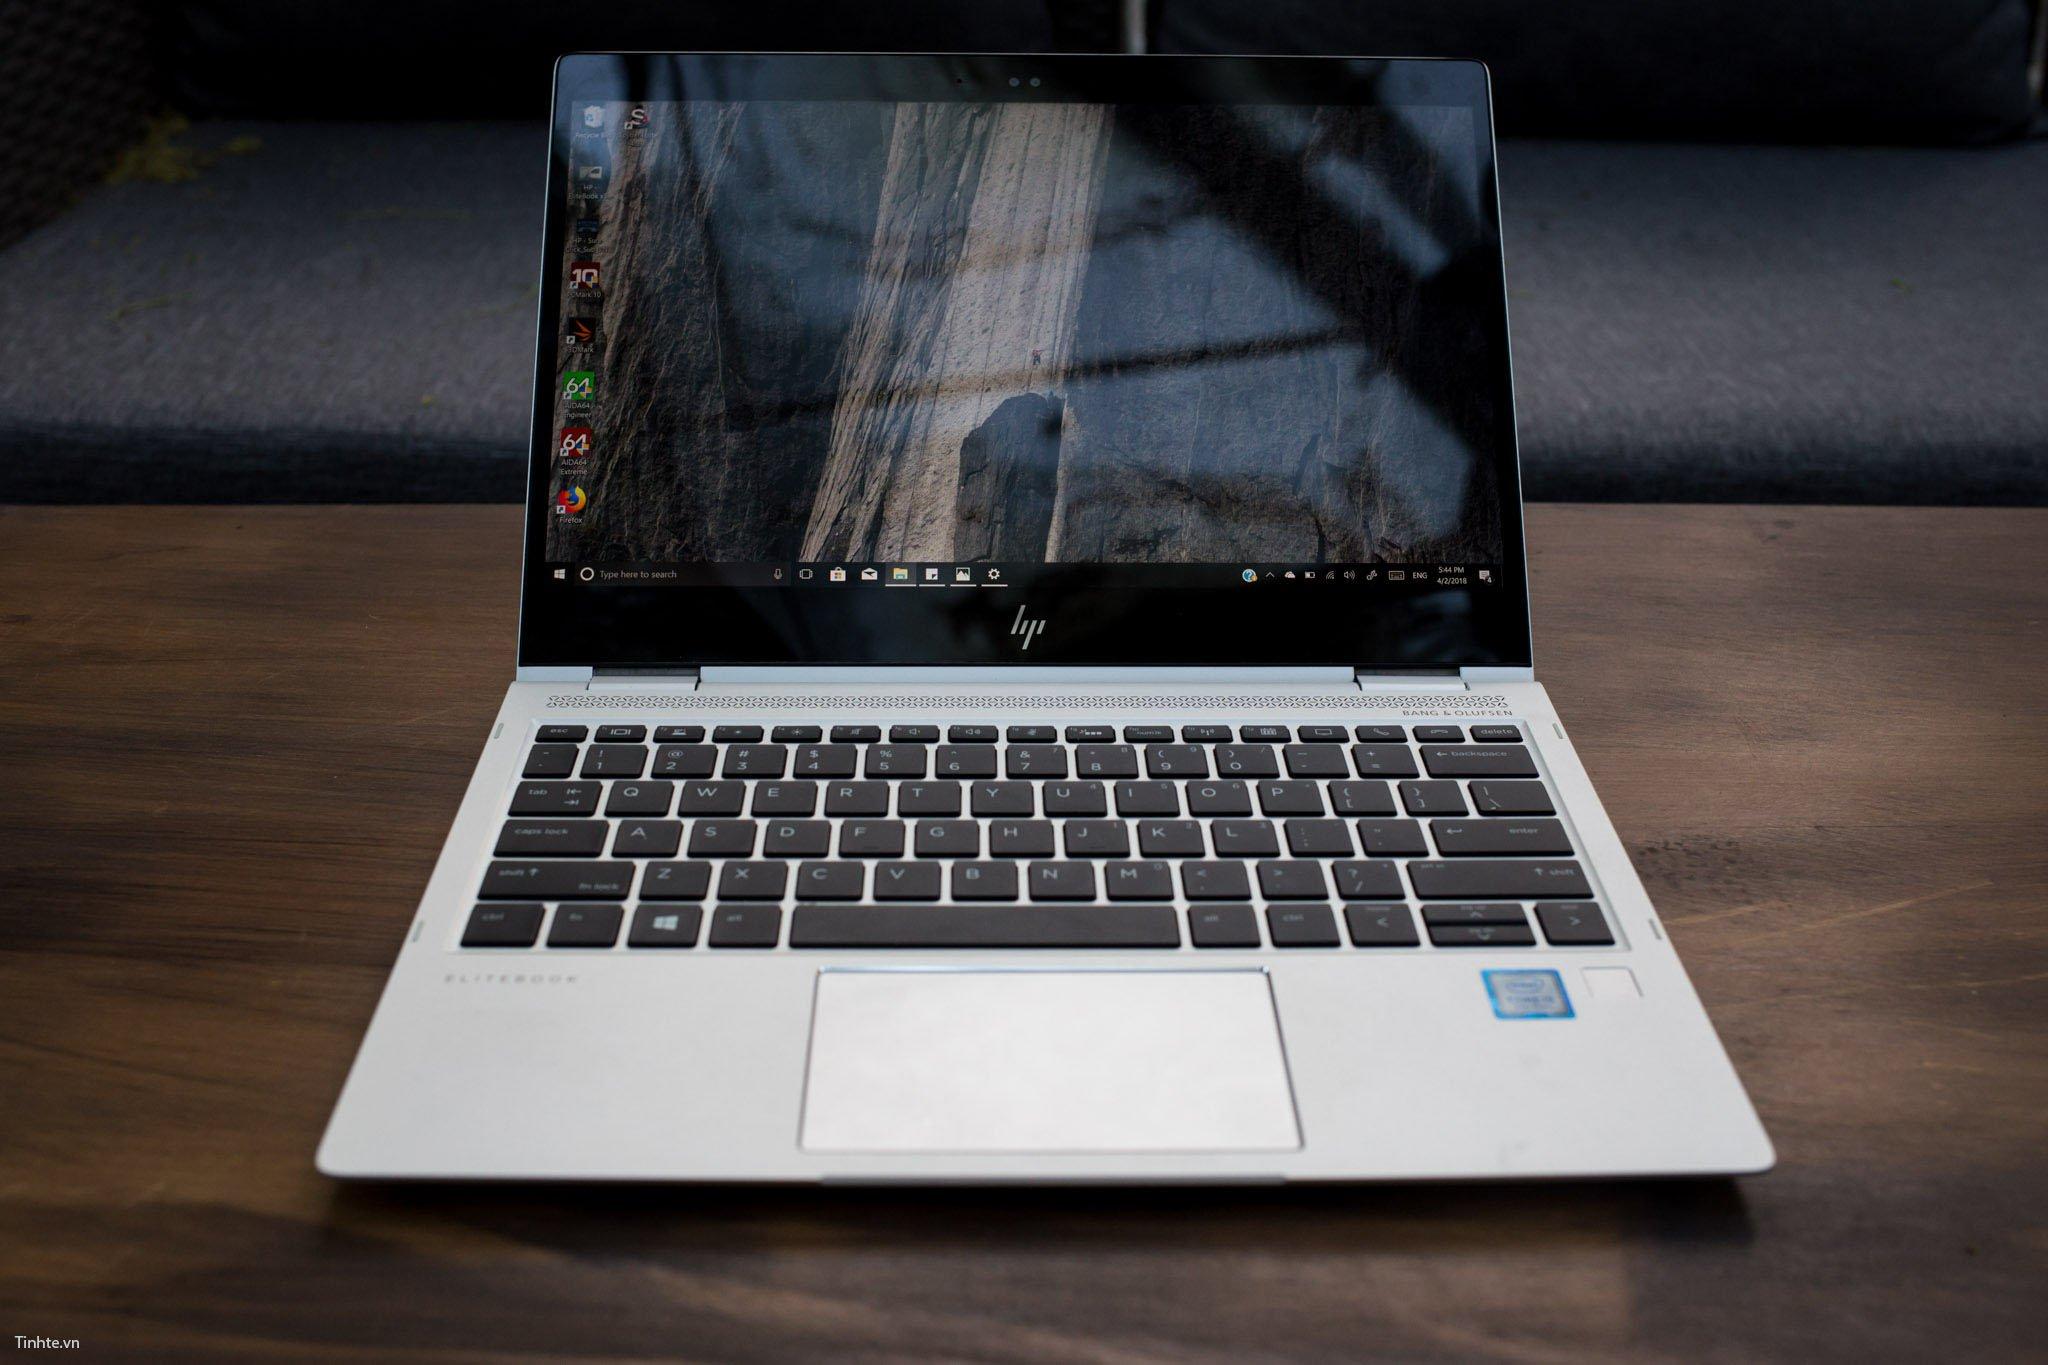 Đang tải Tinhte.vn_EliteBookx360-9.jpg…